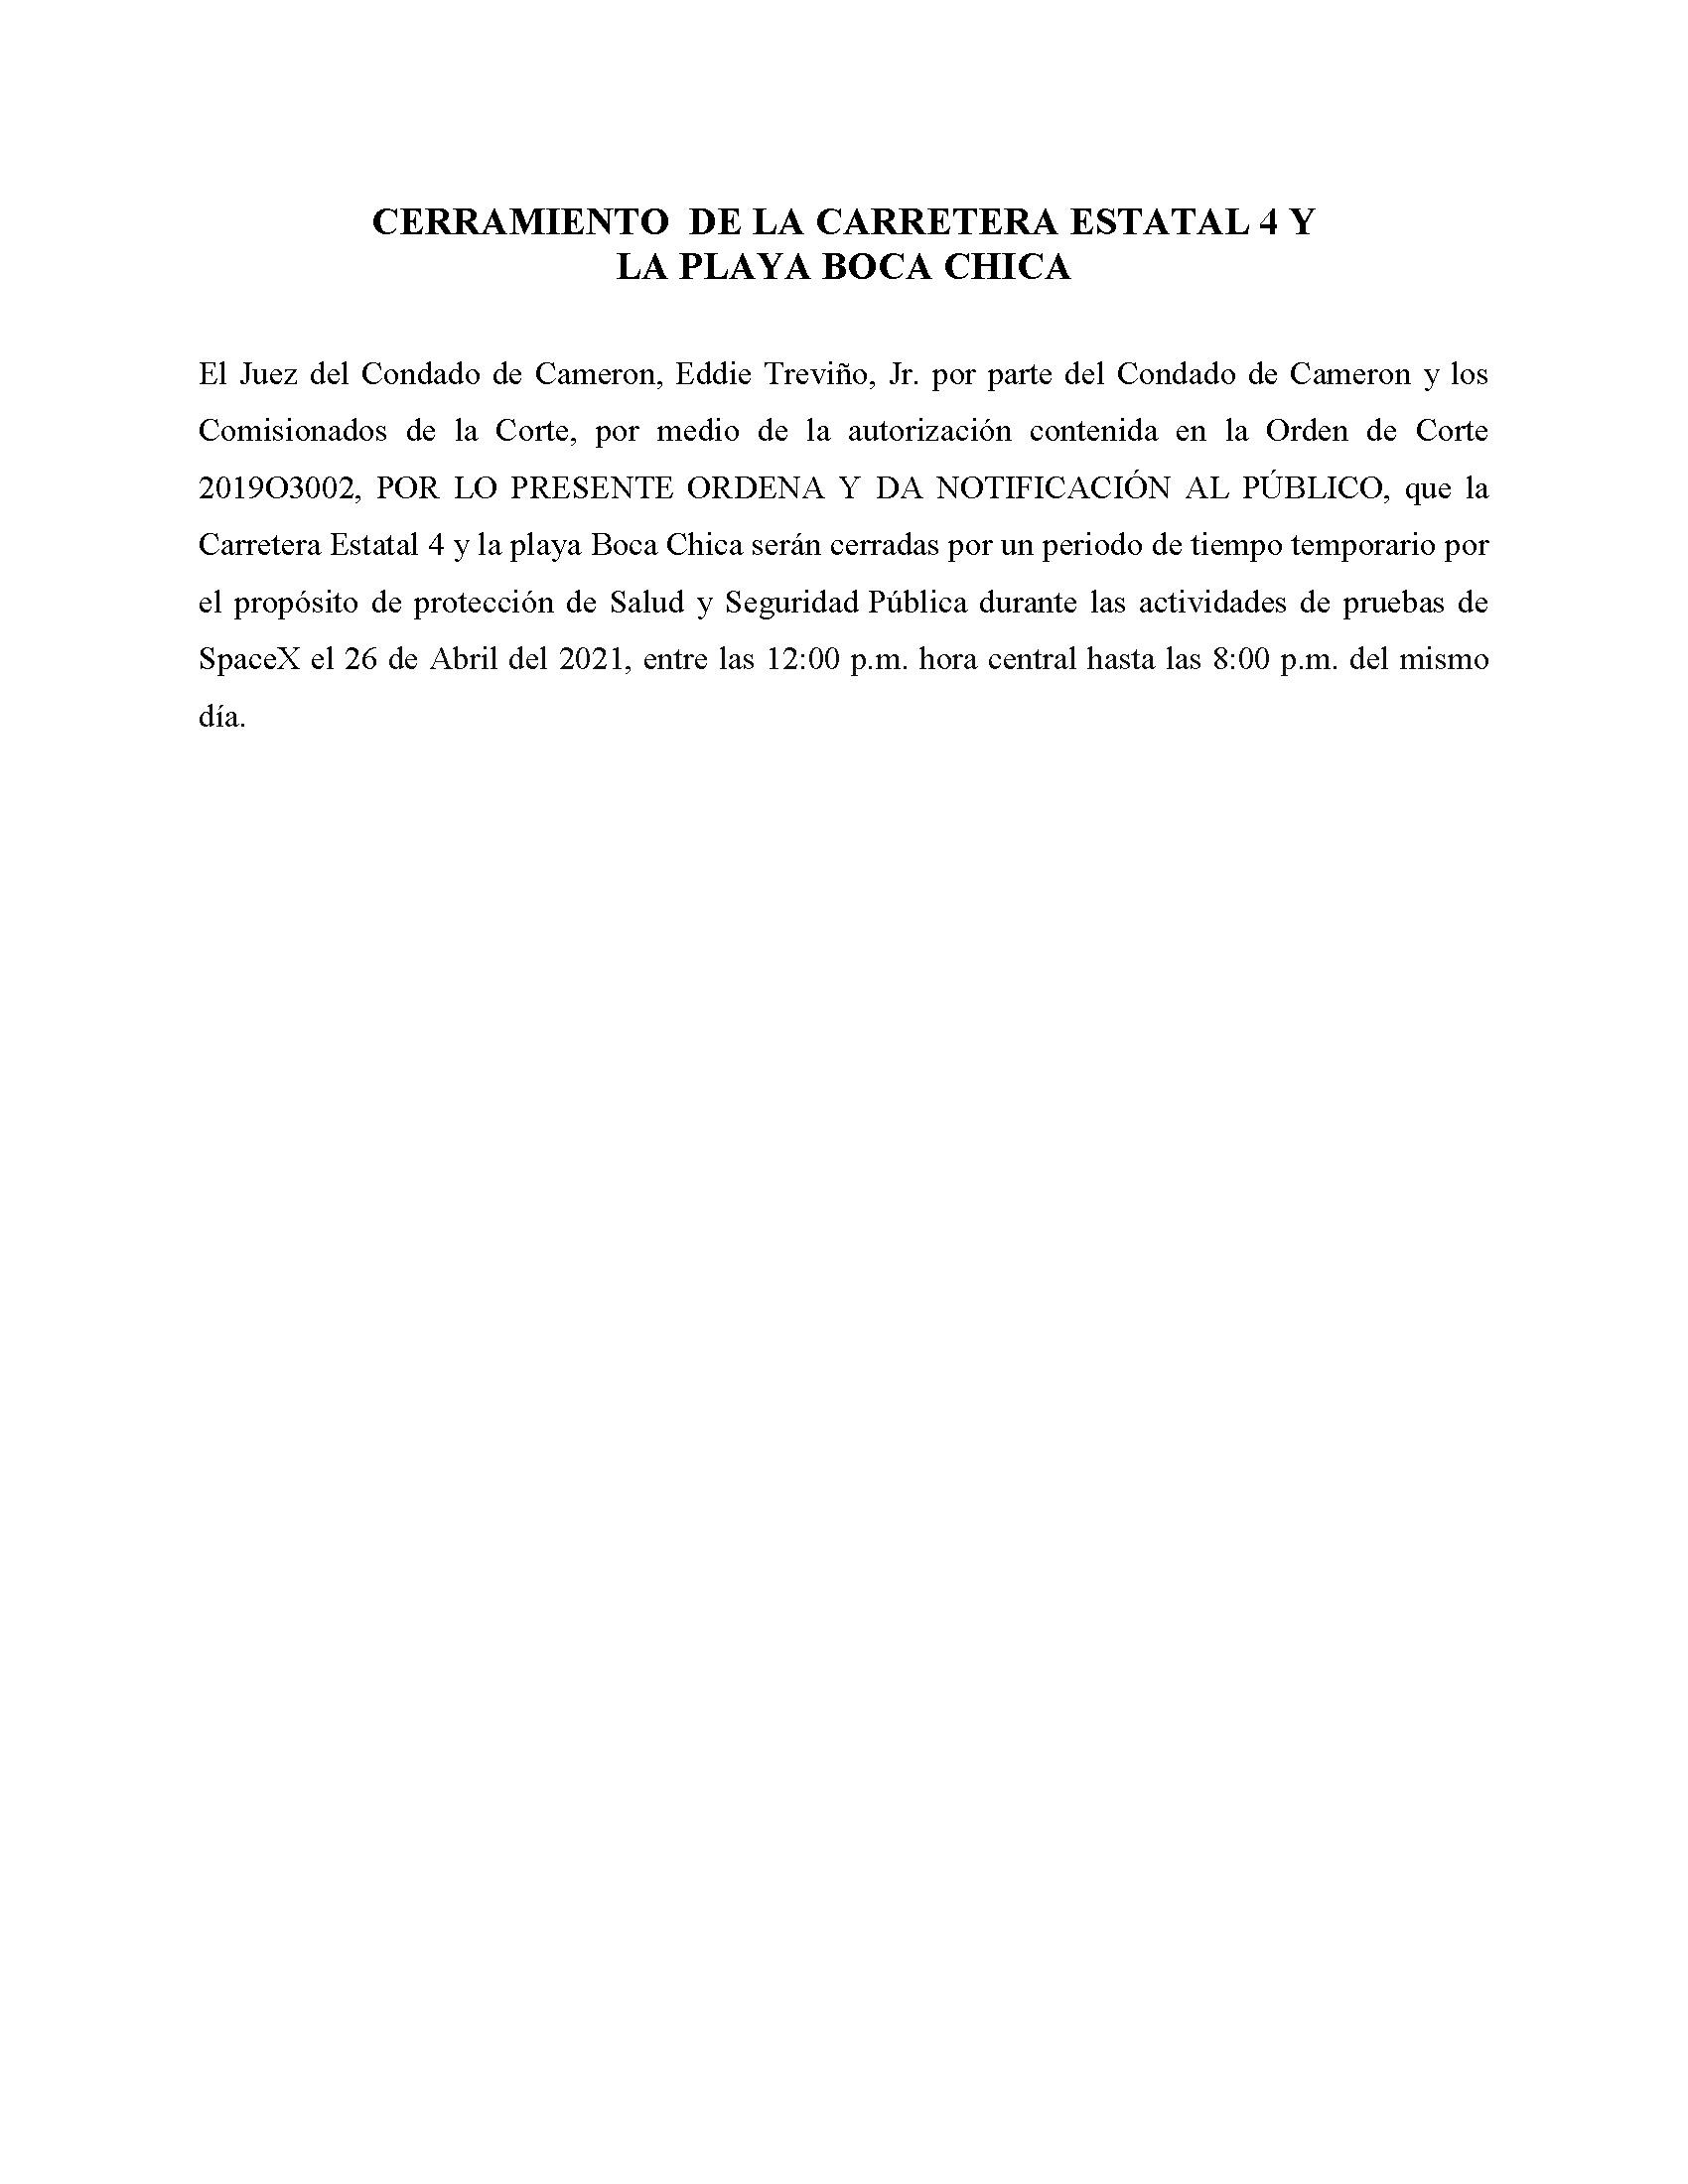 ORDER.CLOSURE OF HIGHWAY 4 Y LA PLAYA BOCA CHICA.SPANISH.04.26.2021